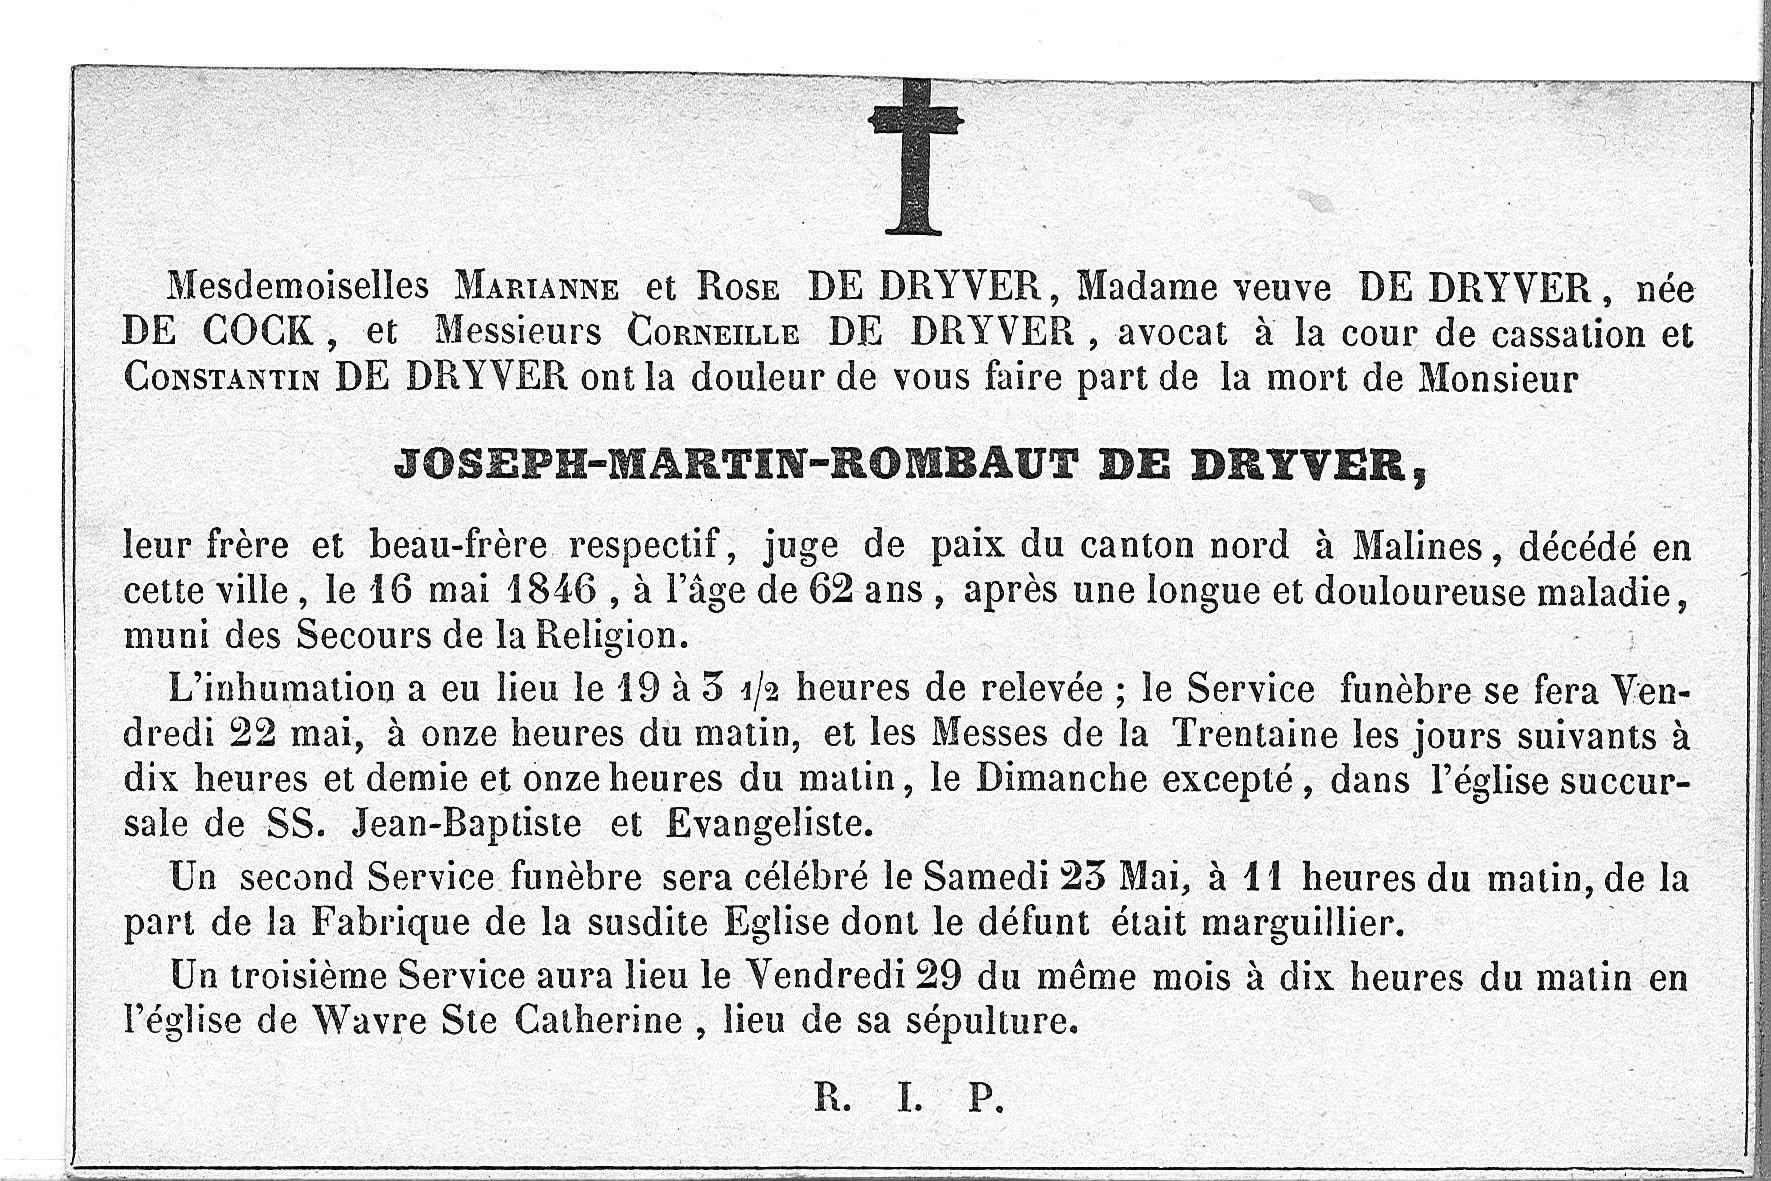 Joseph-Martin-Rombaut-(1846)-20120817110443_00066.jpg